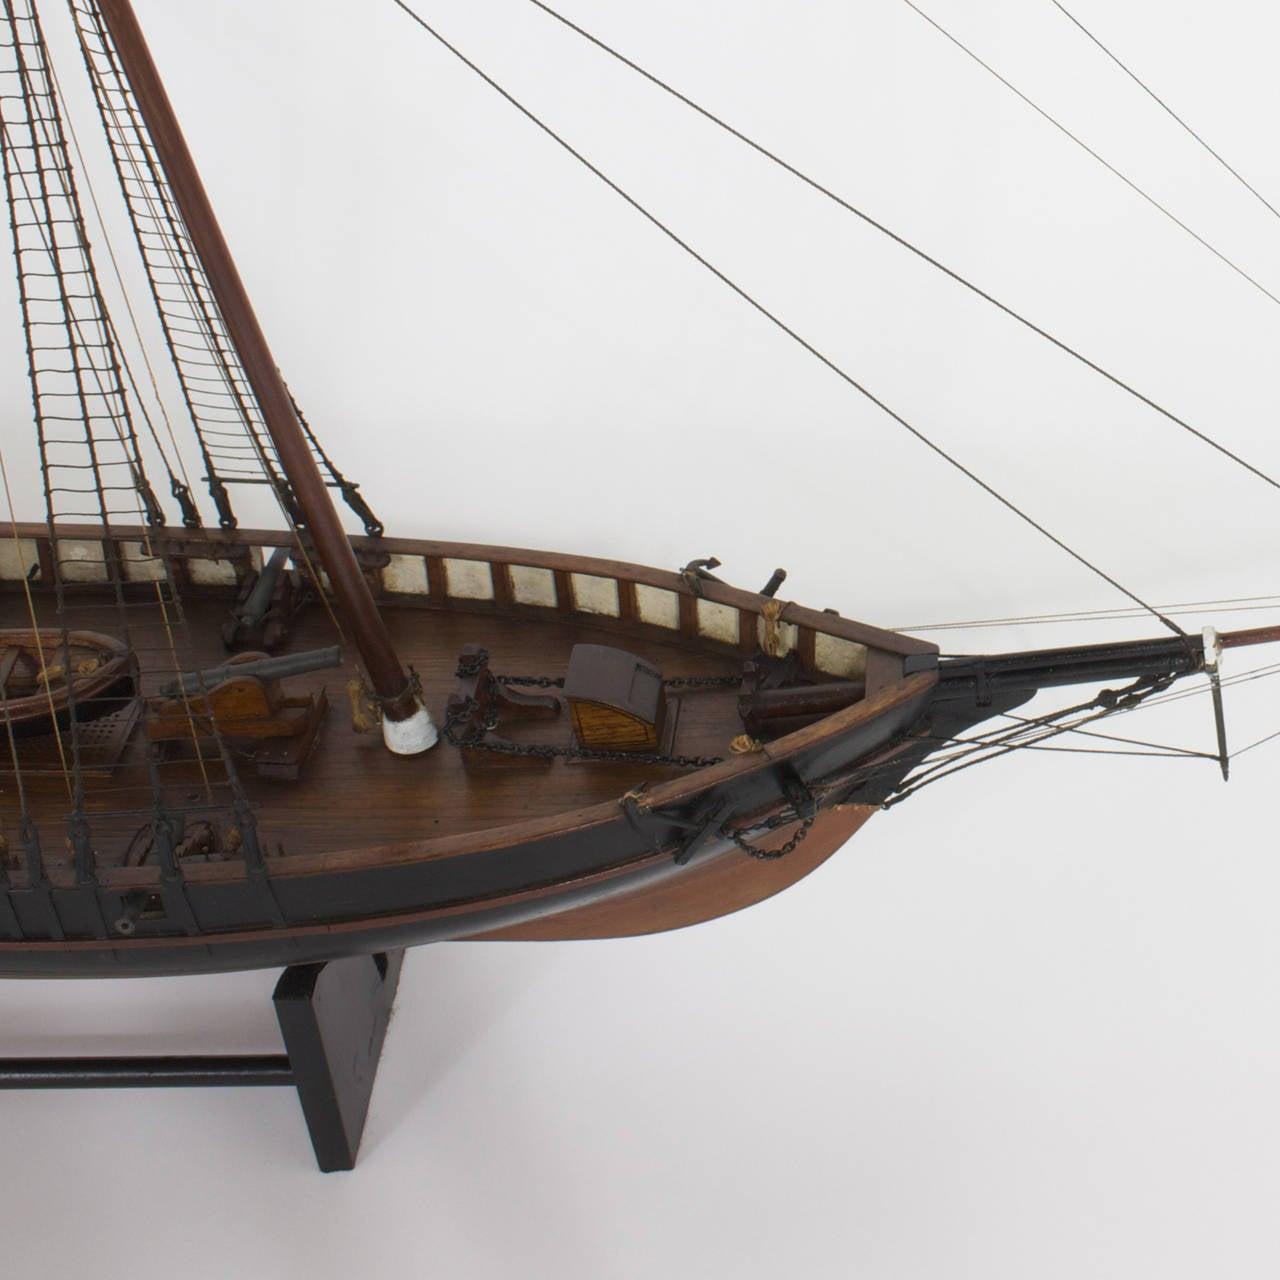 English Mahogany Schooner Ship or Boat Model For Sale